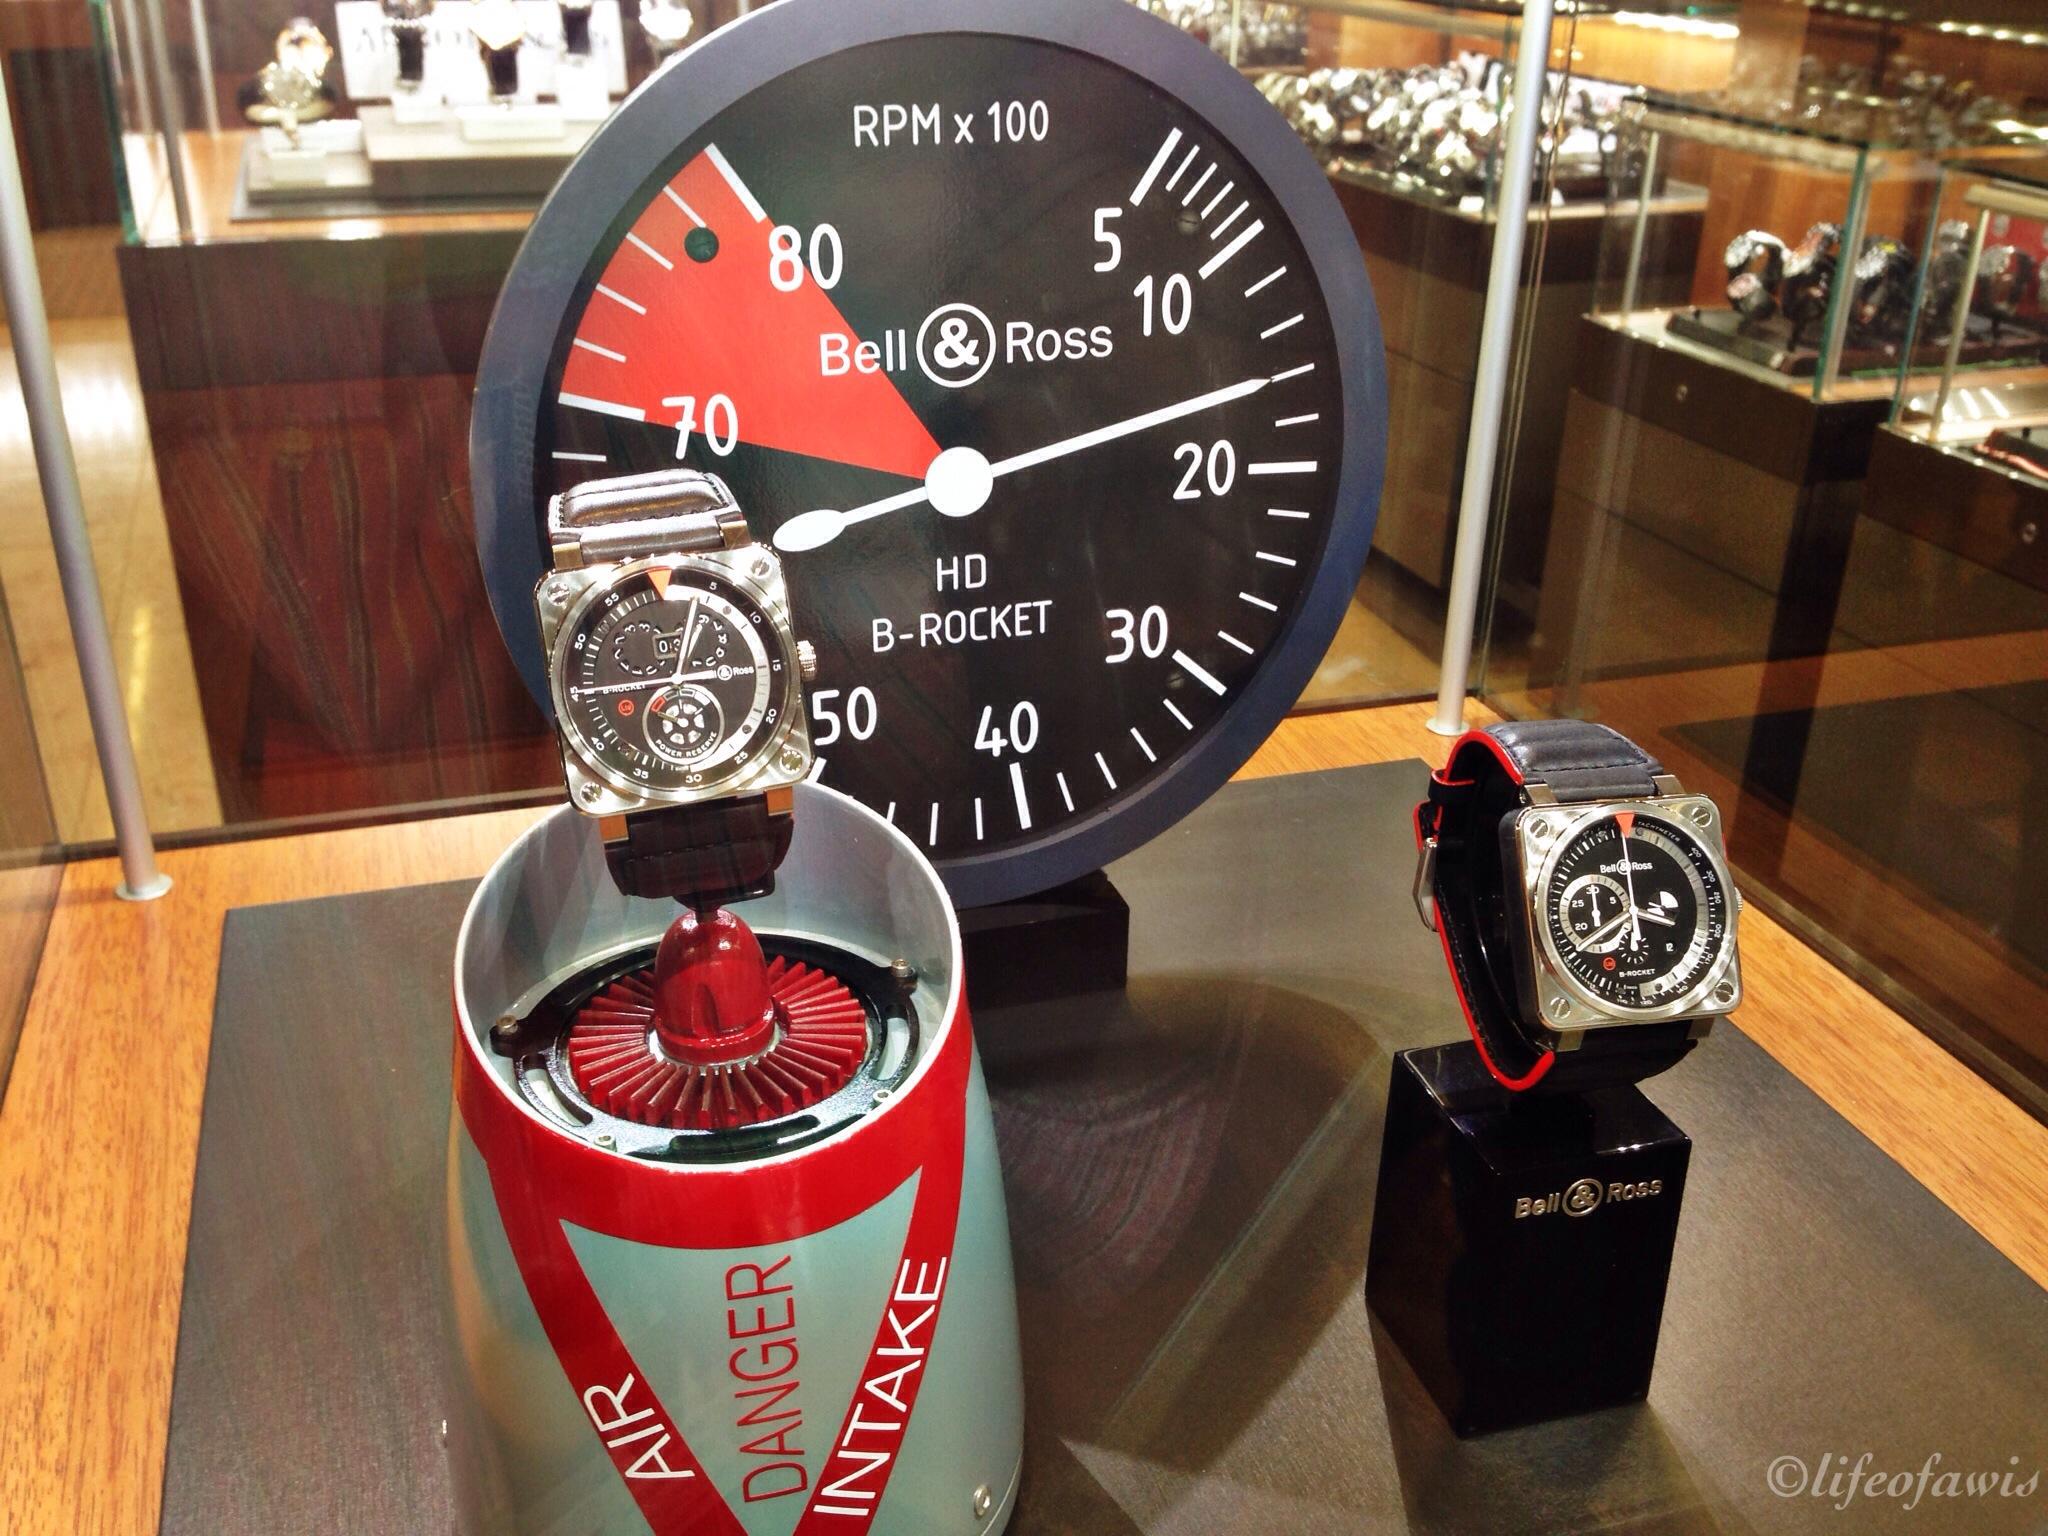 The B-Rocket watches on display at Feldmar Watch Company.